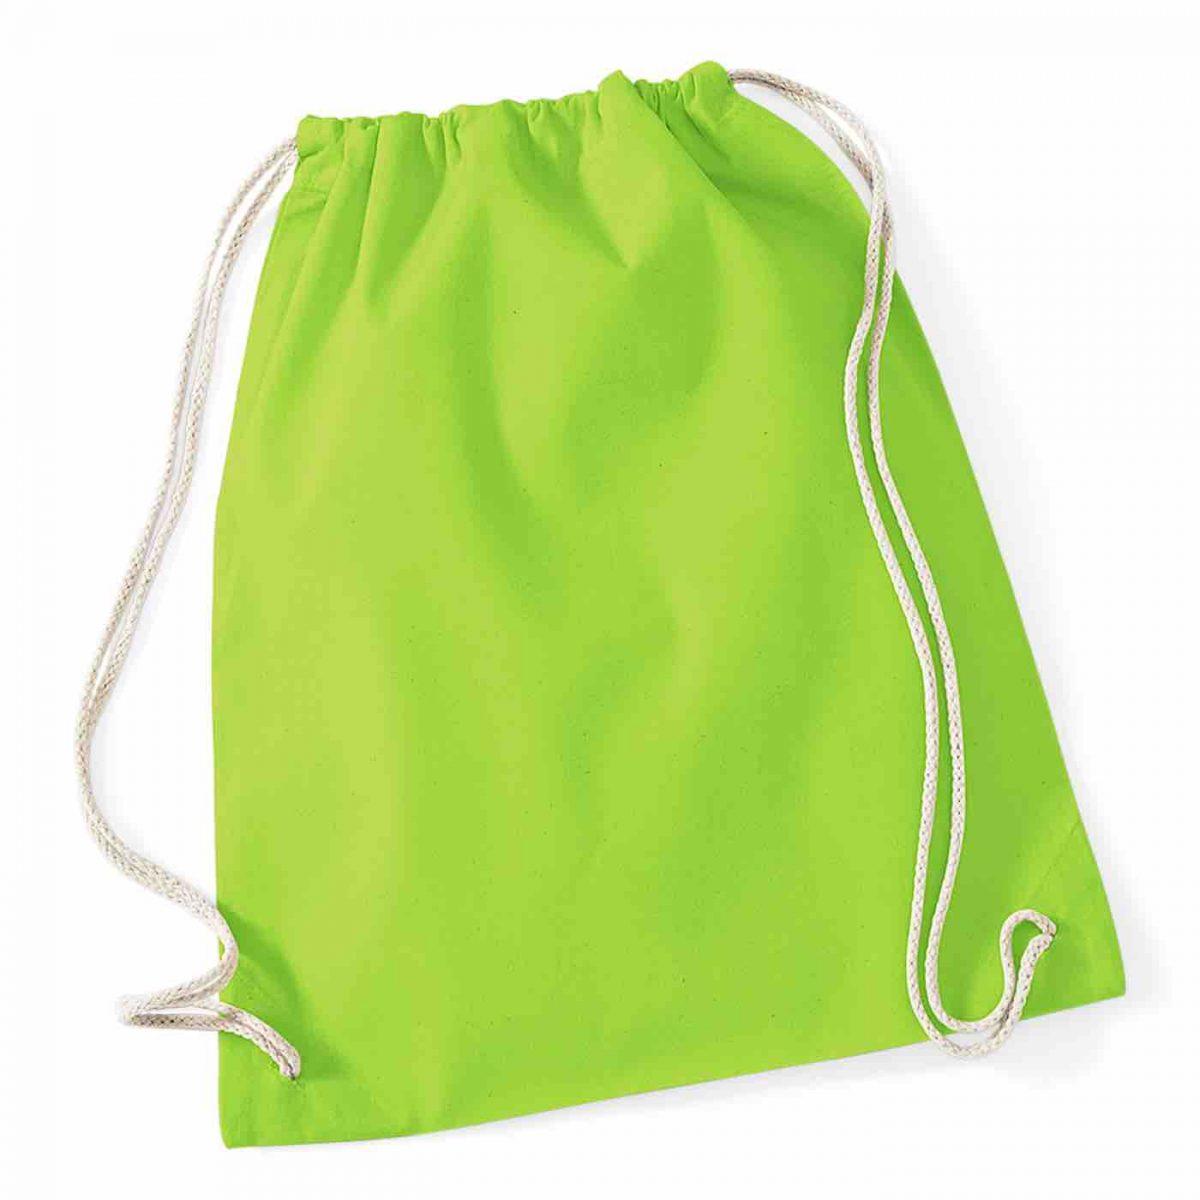 Lime Green Cotton Tote Bag